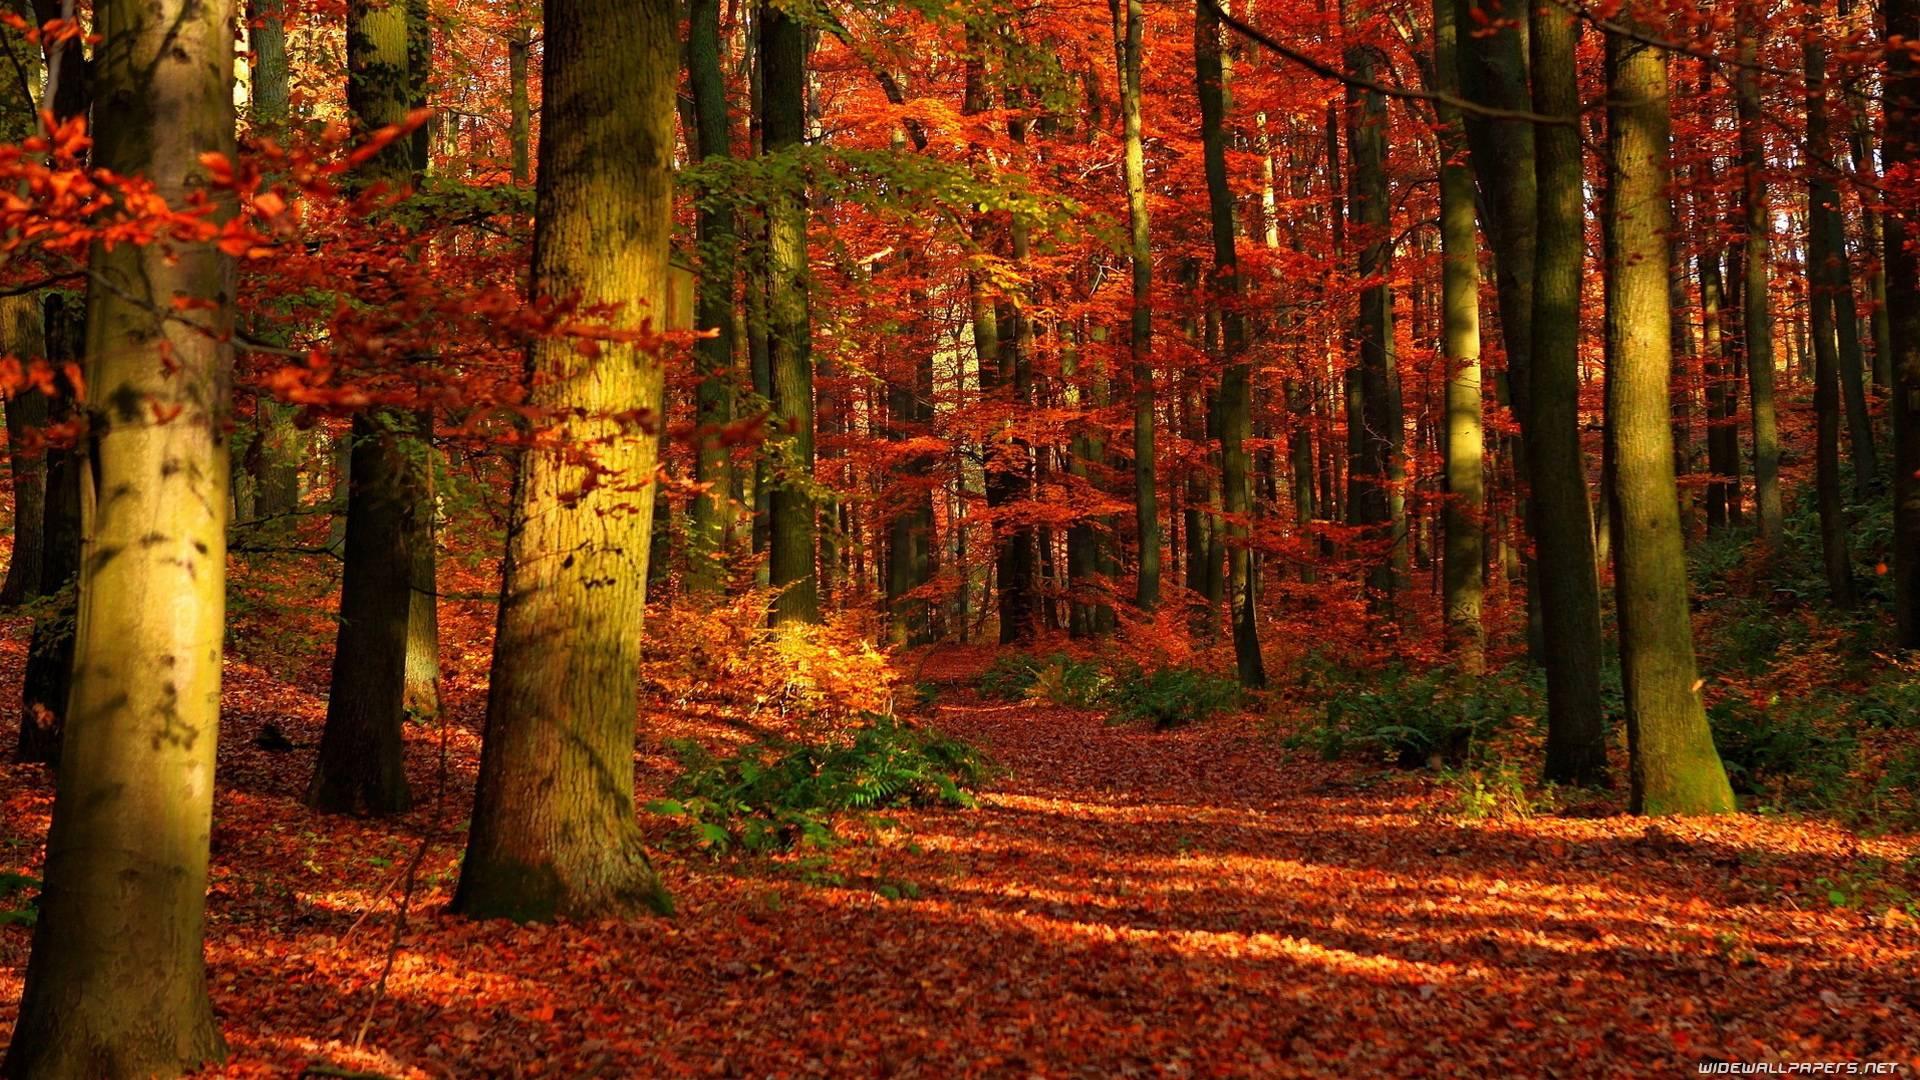 Cool And Beautiful Nature Desktop Wallpaper Image: Cool Nature Desktop Backgrounds